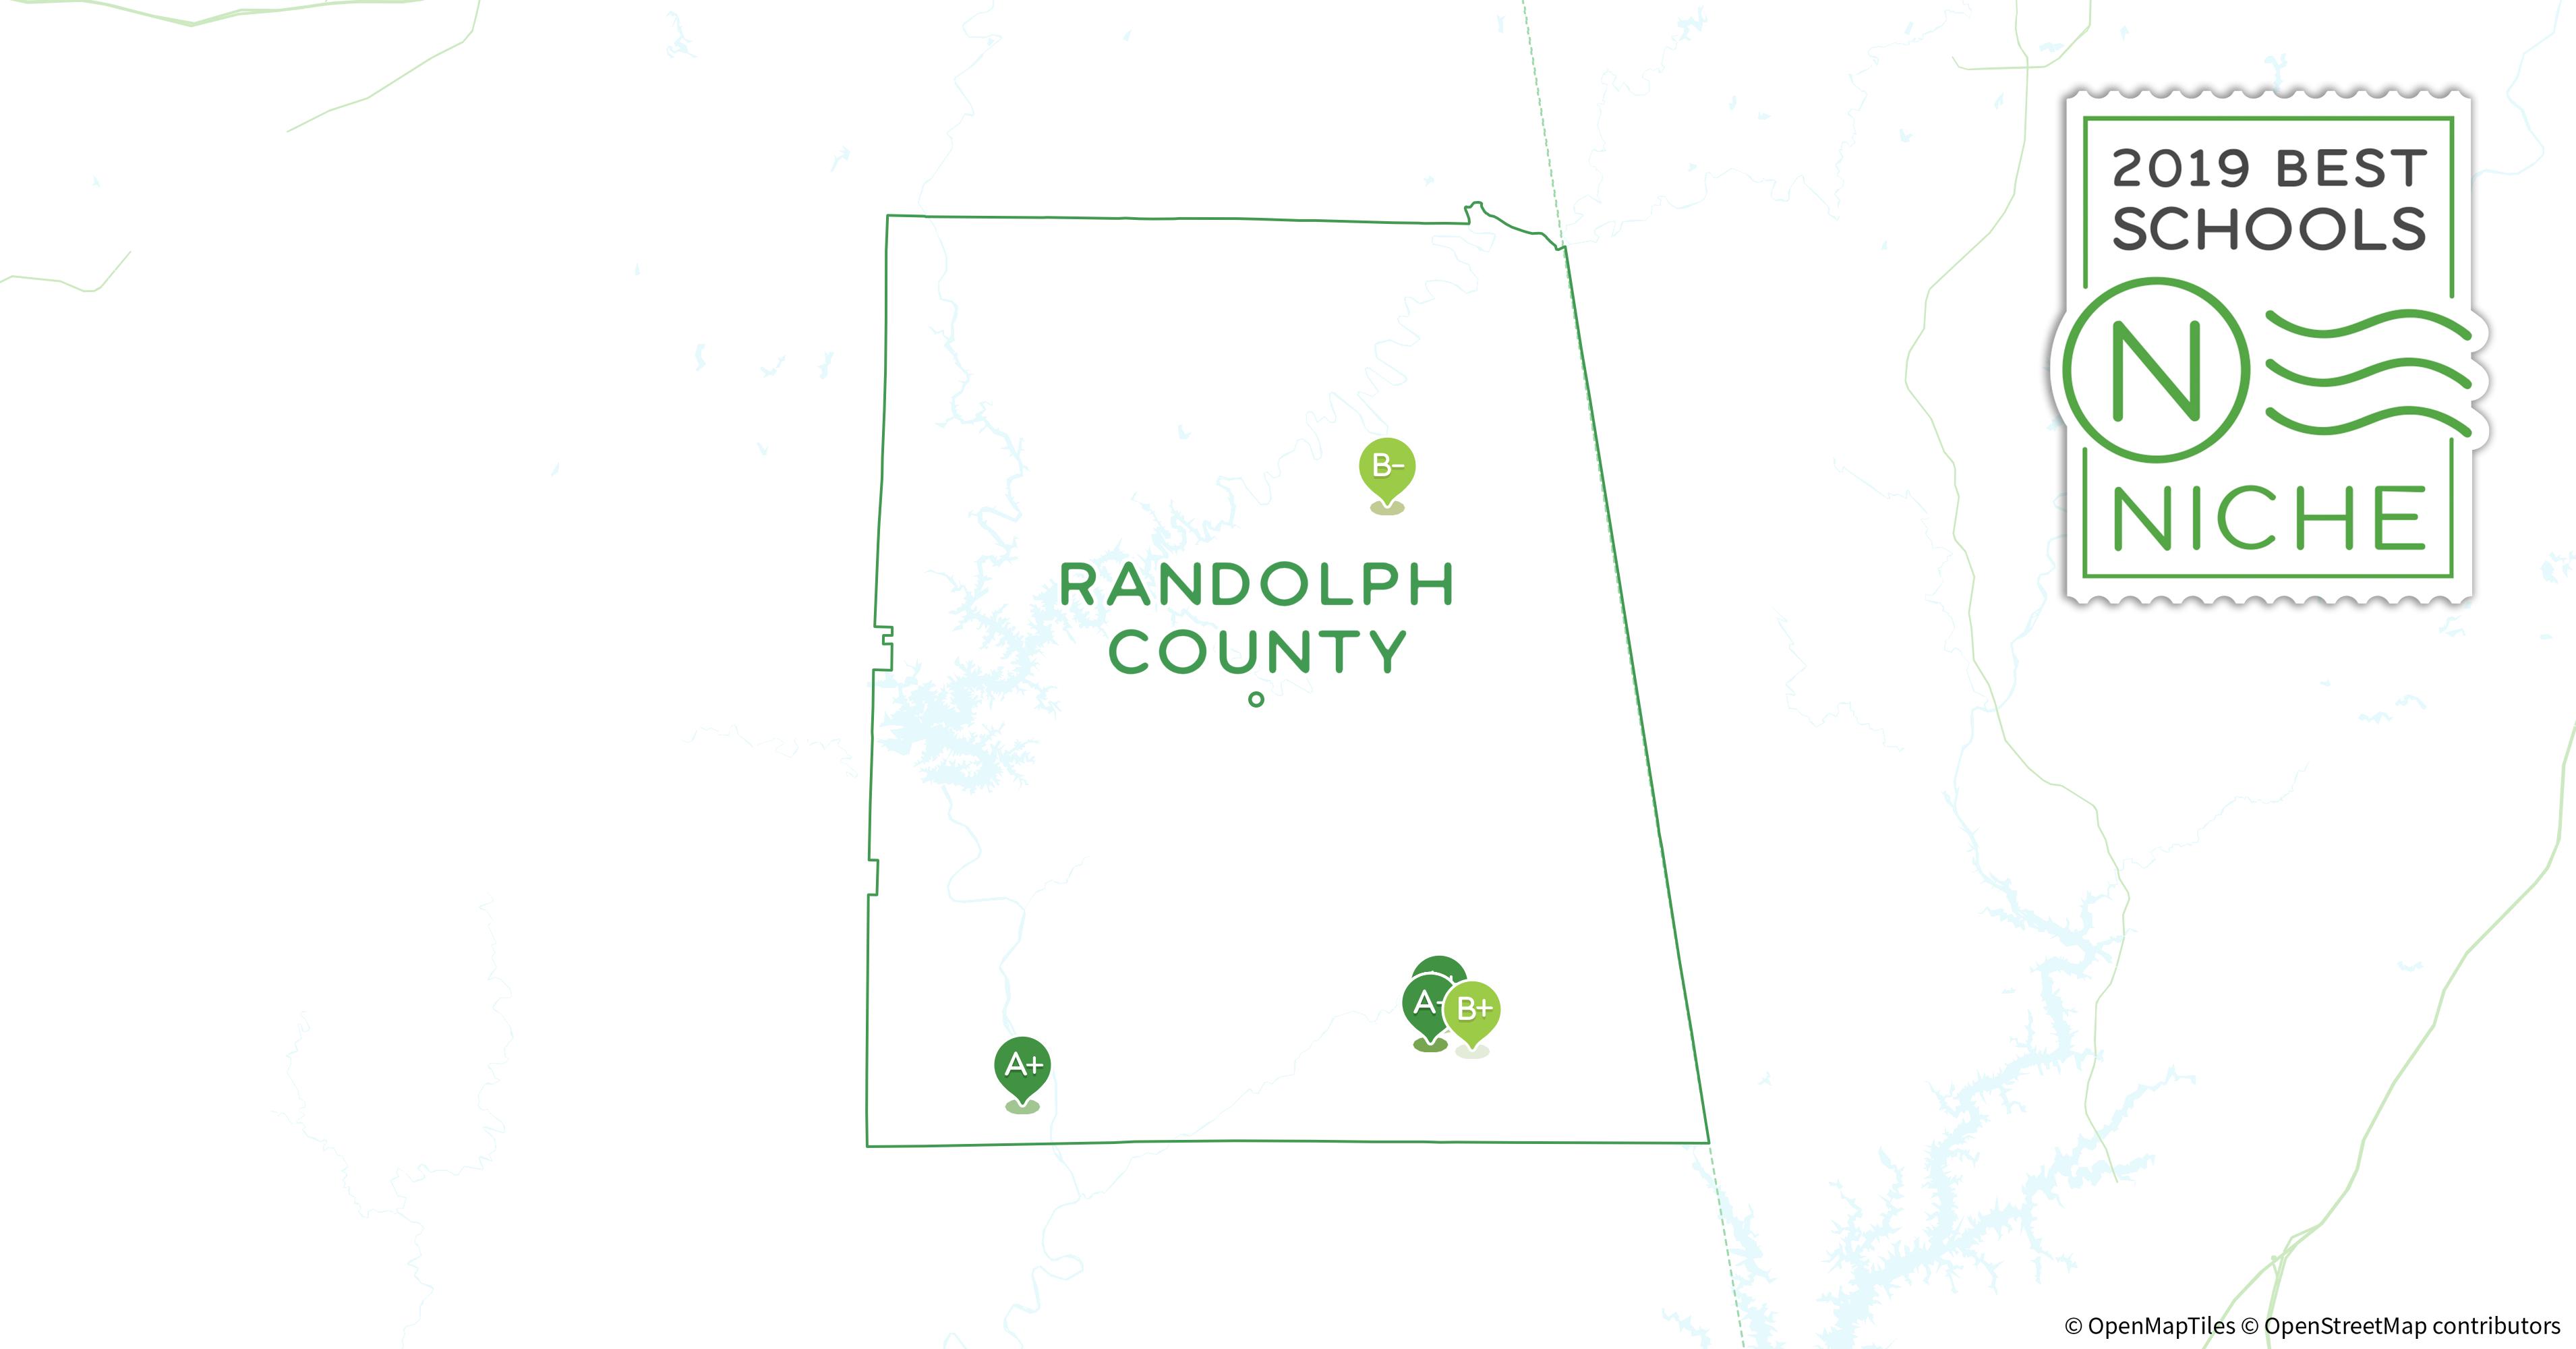 2019 Best Public Elementary Schools in Randolph County, AL